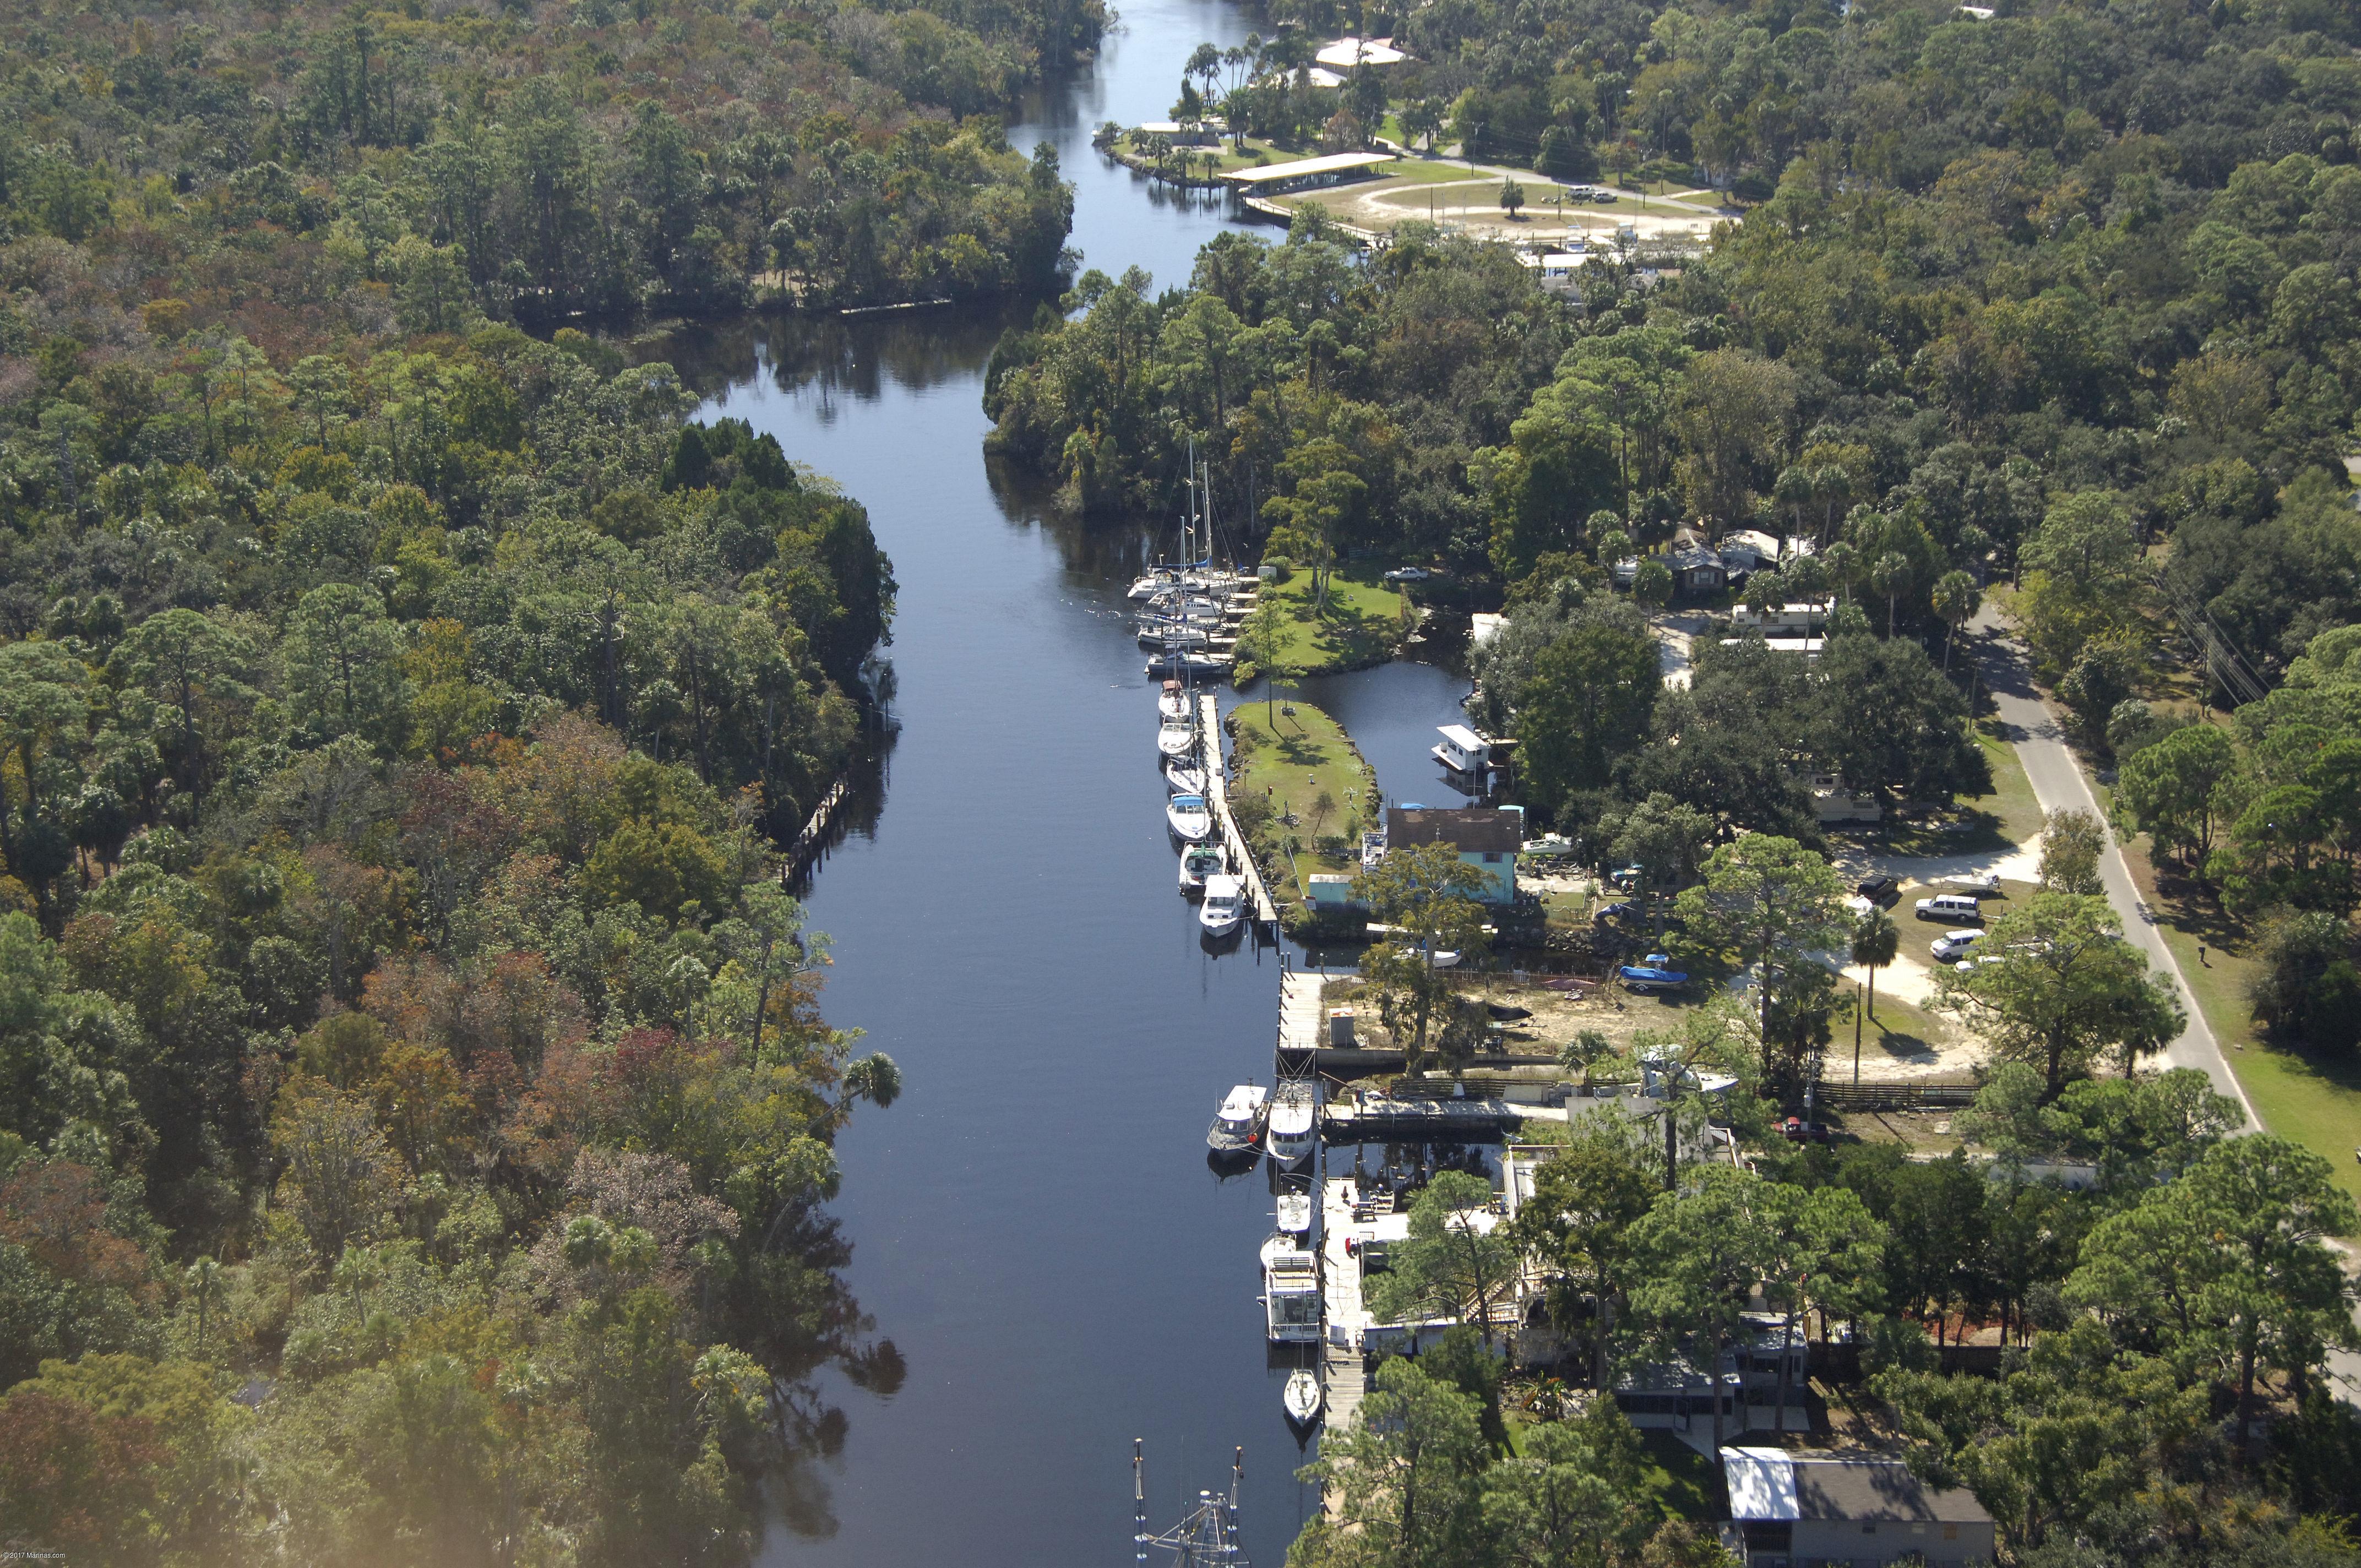 Bs Marina  Campground In Yankeetown FL United States Marina - Yankeetown florida map